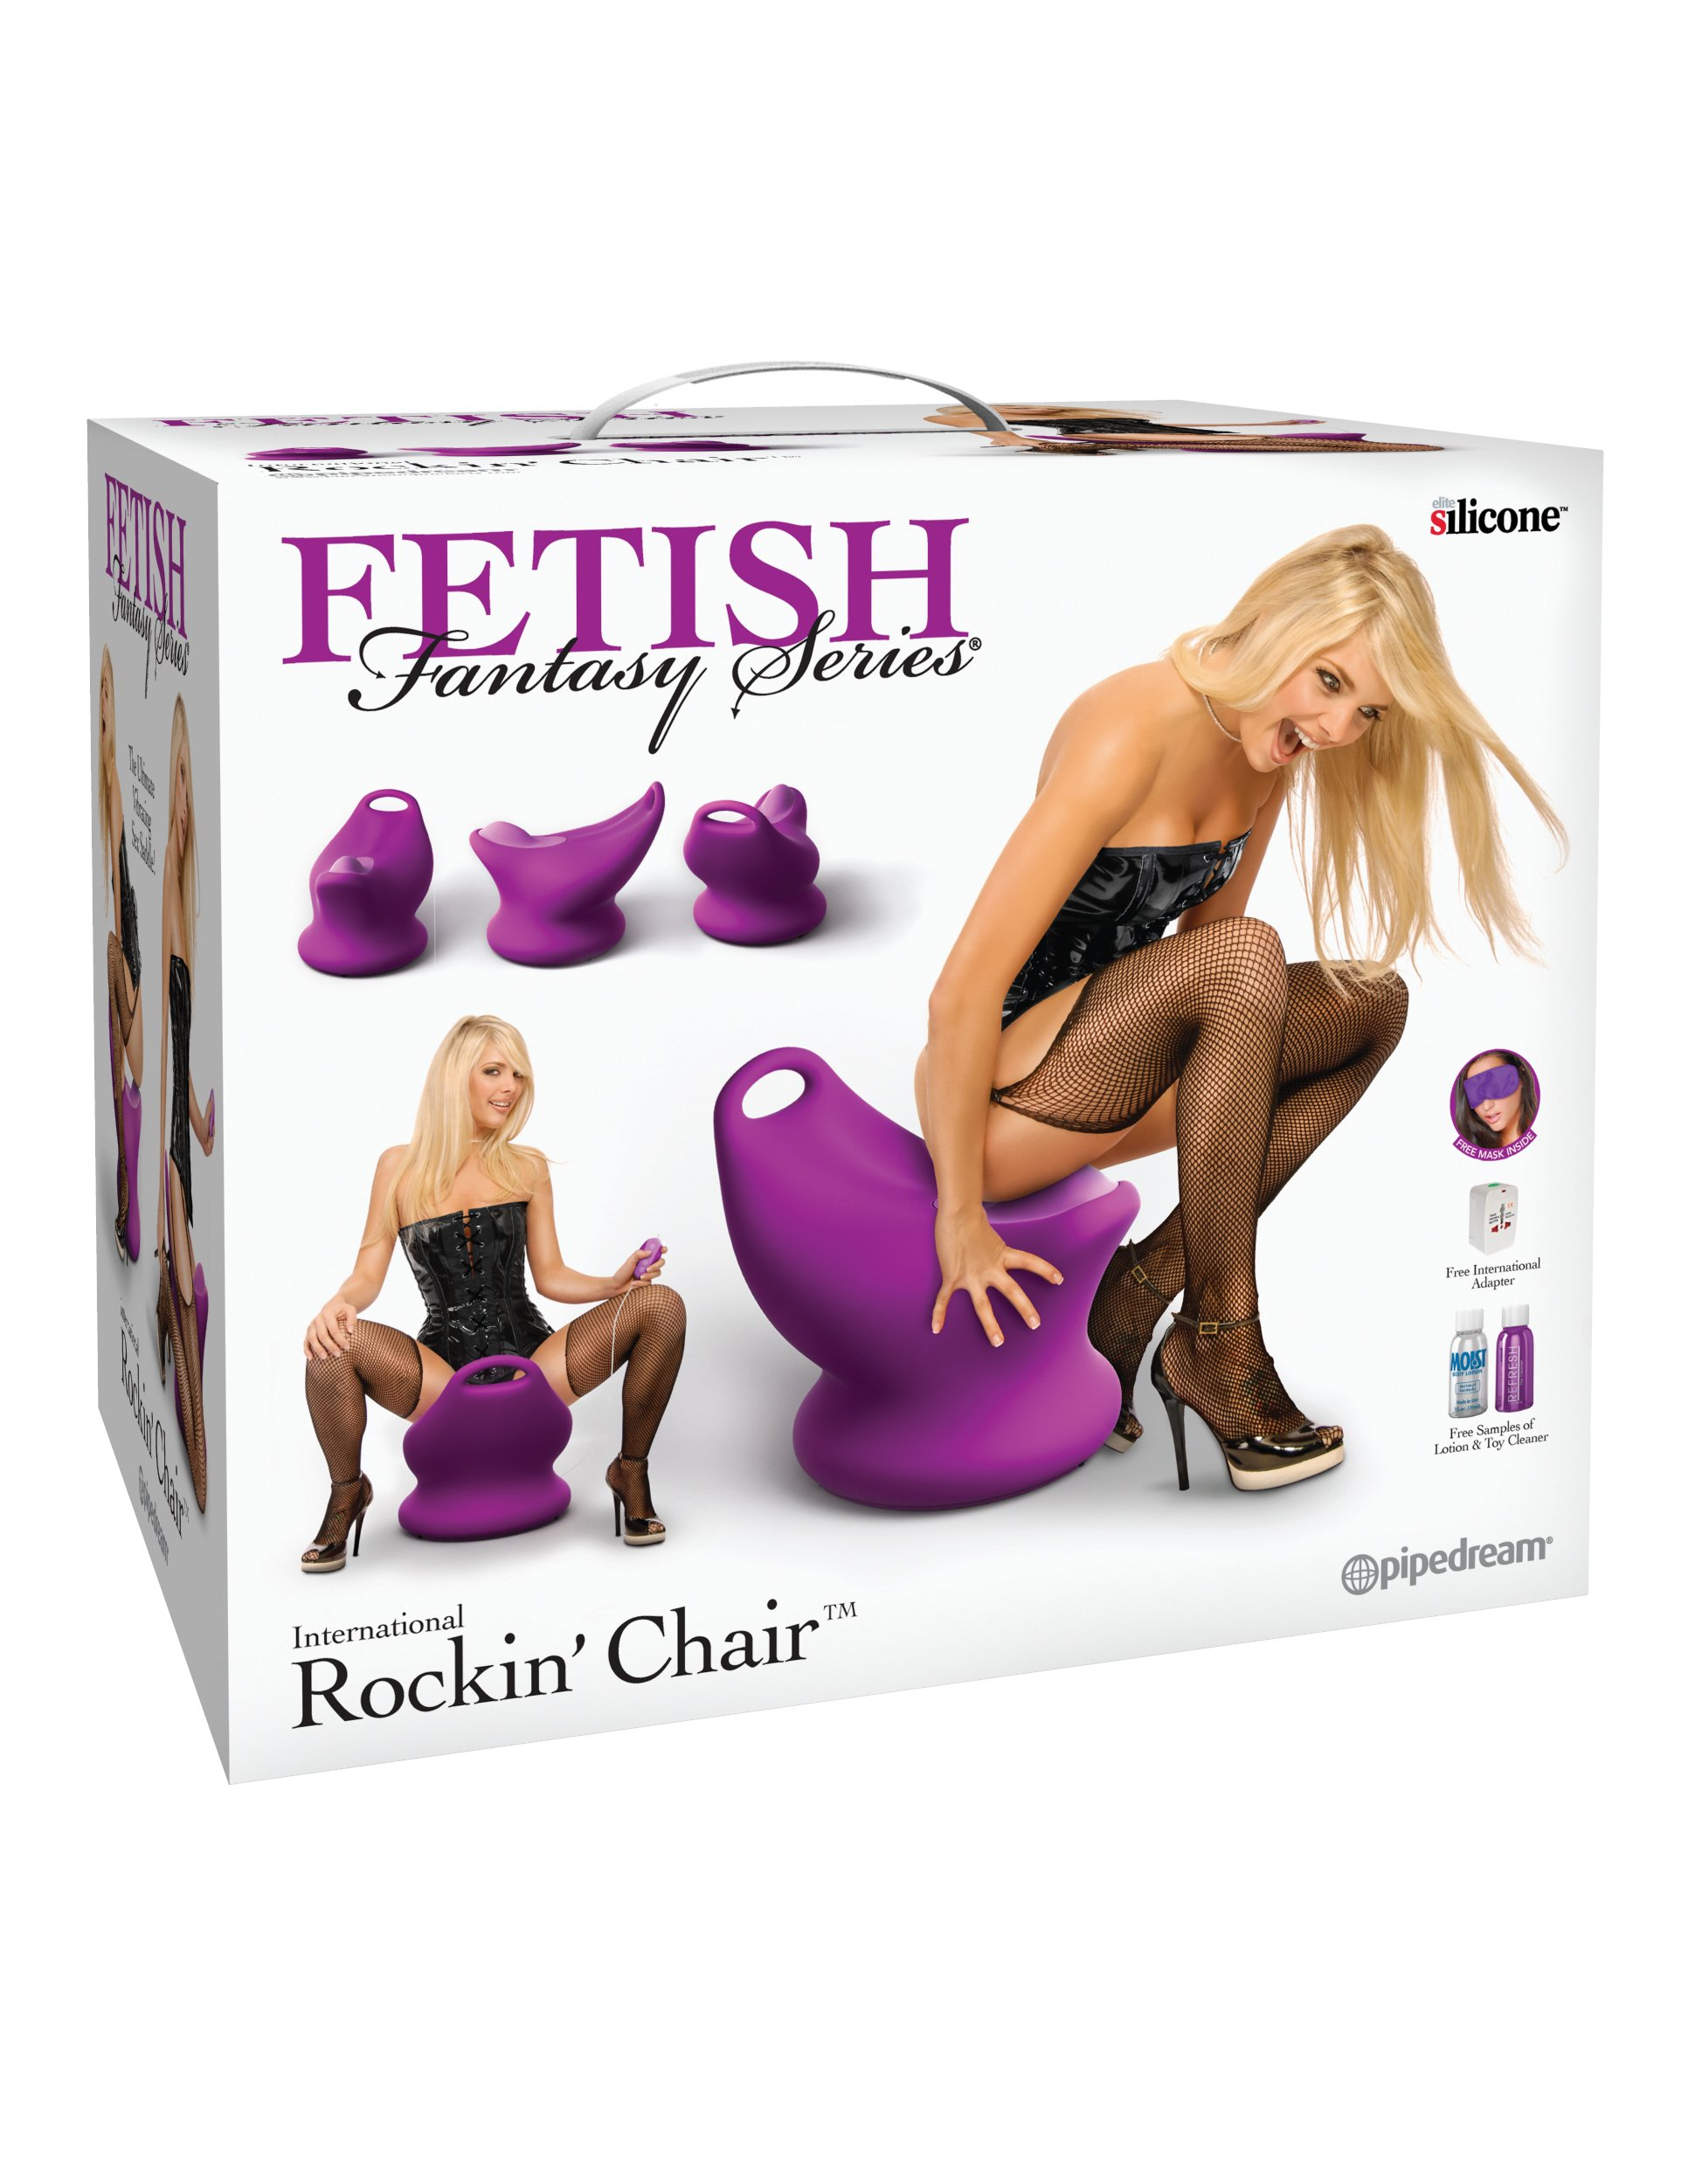 Fetish Fantasy Series International Rockin' Chair - Purple by Pipedream